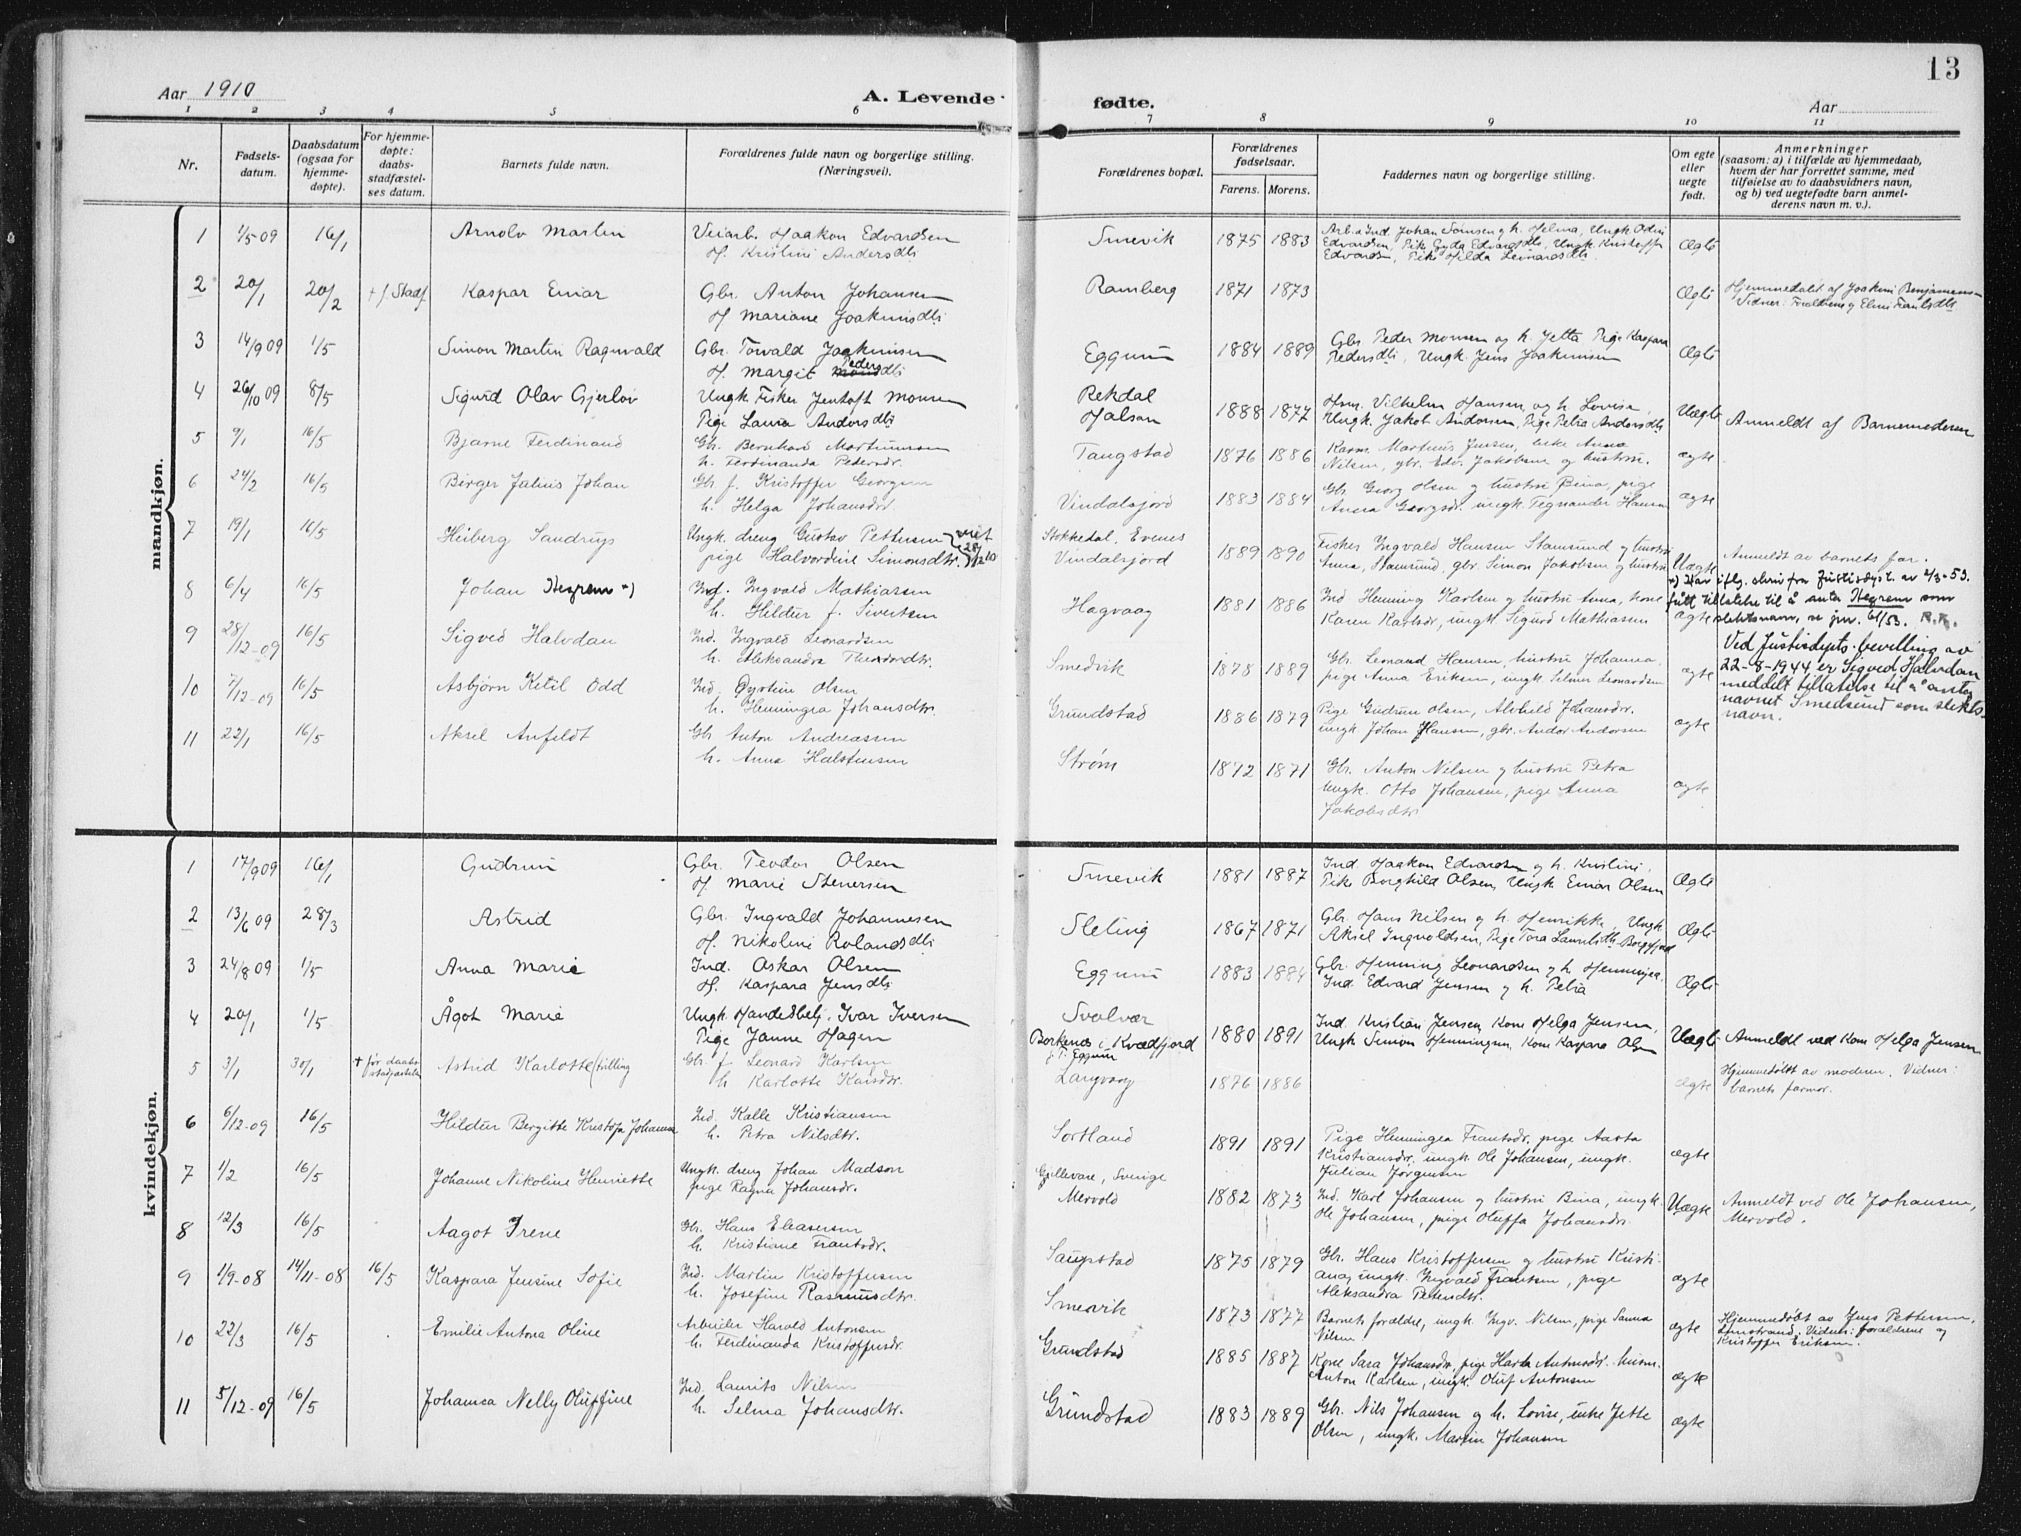 SAT, Ministerialprotokoller, klokkerbøker og fødselsregistre - Nordland, 880/L1135: Ministerialbok nr. 880A09, 1908-1919, s. 13